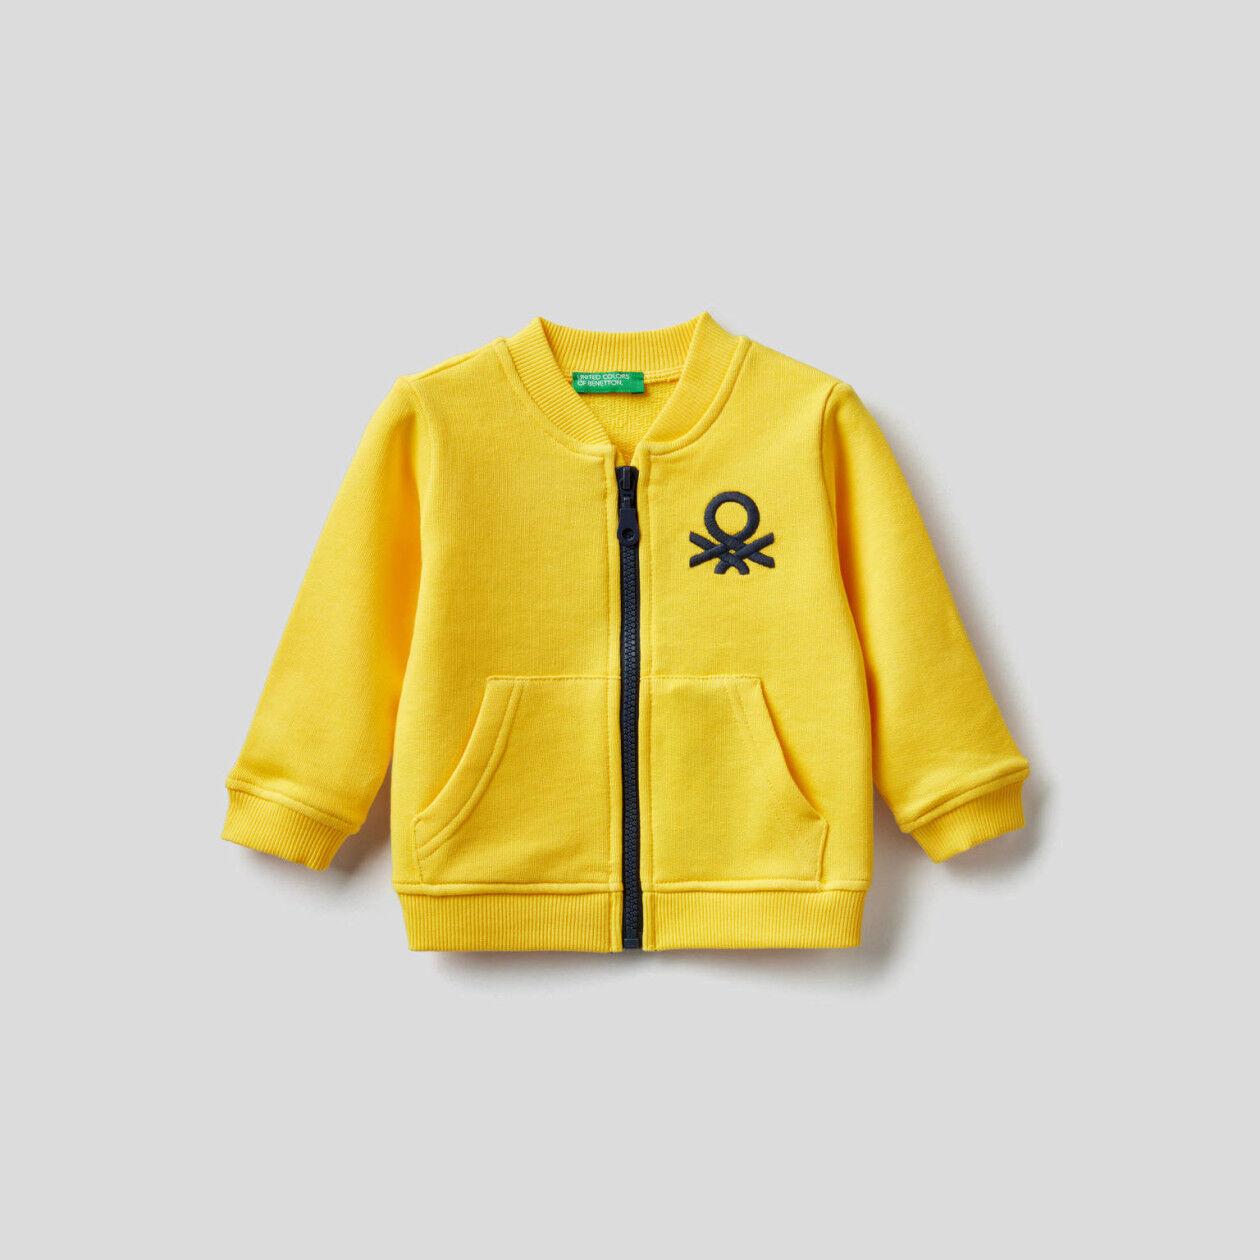 100% cotton sweatshirt with zipper